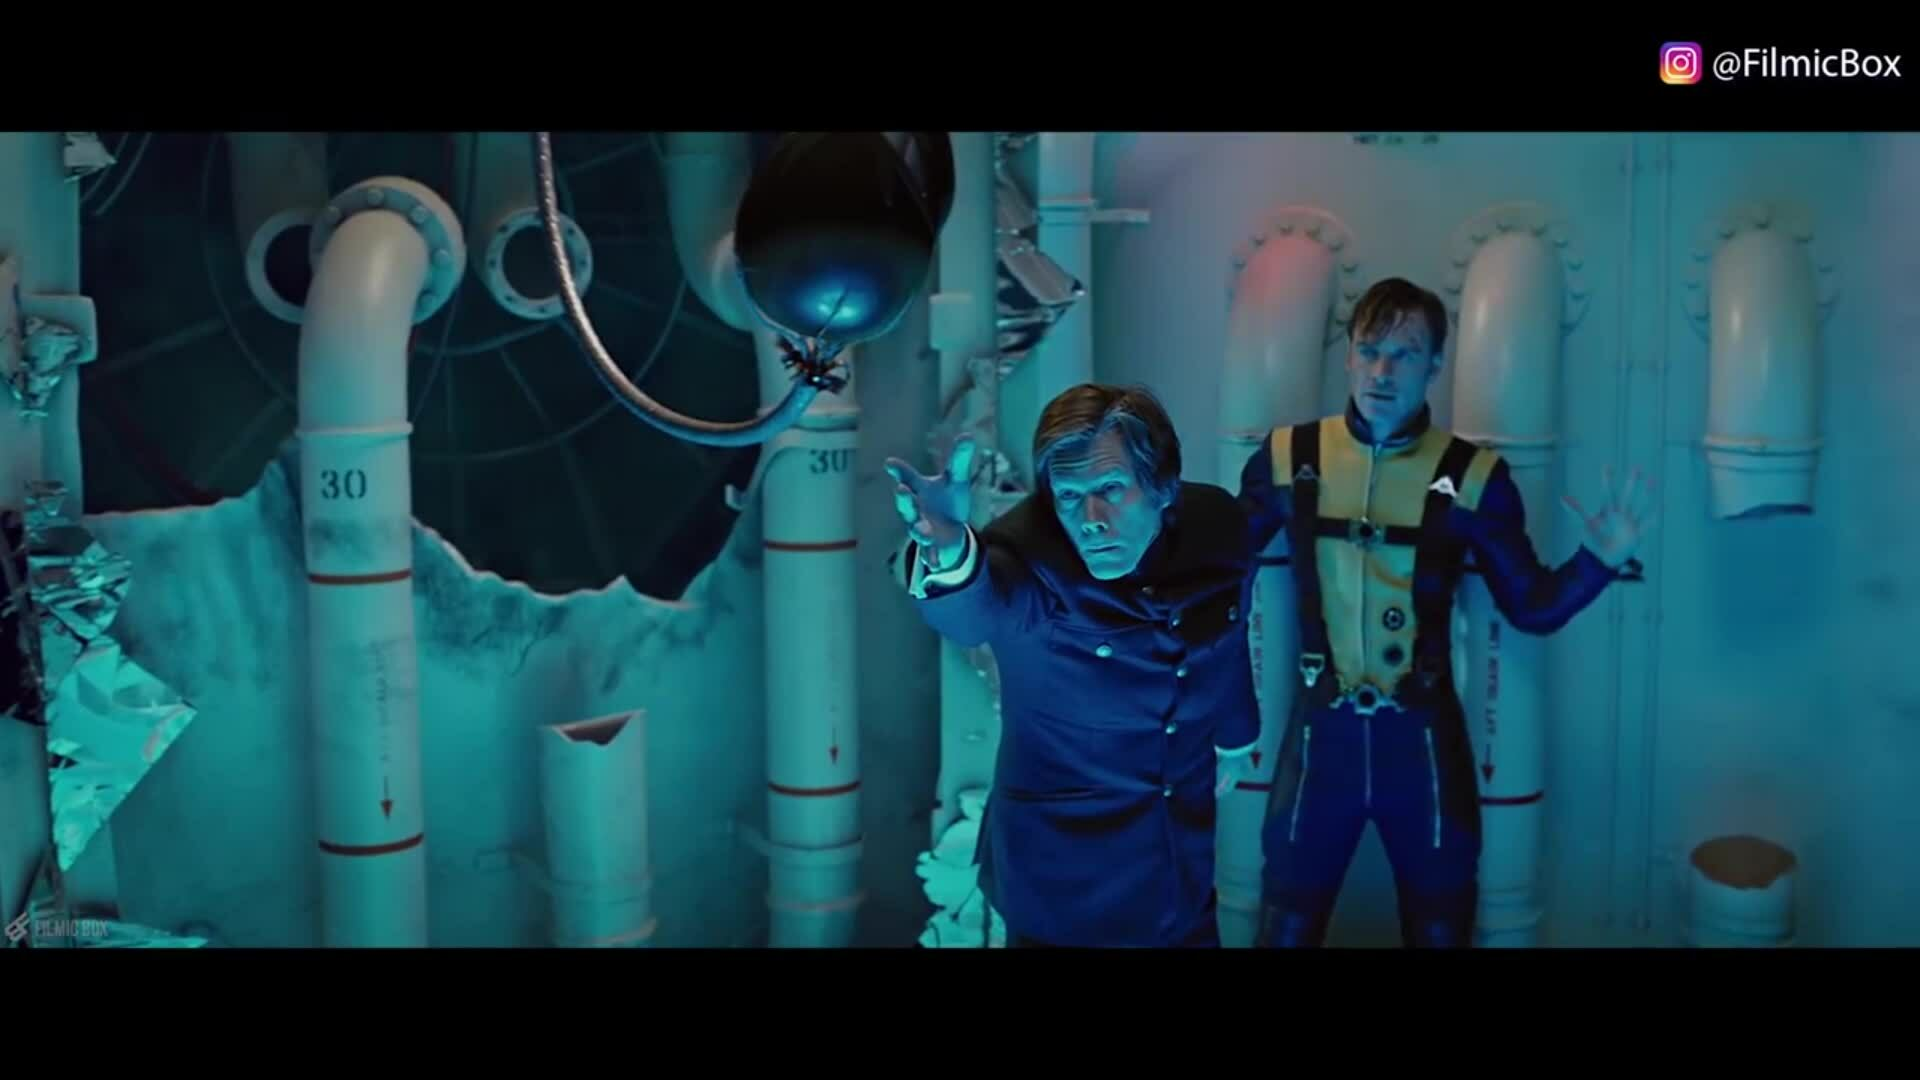 Trận chiến bờ biển trong X-Men: First Class (2011)